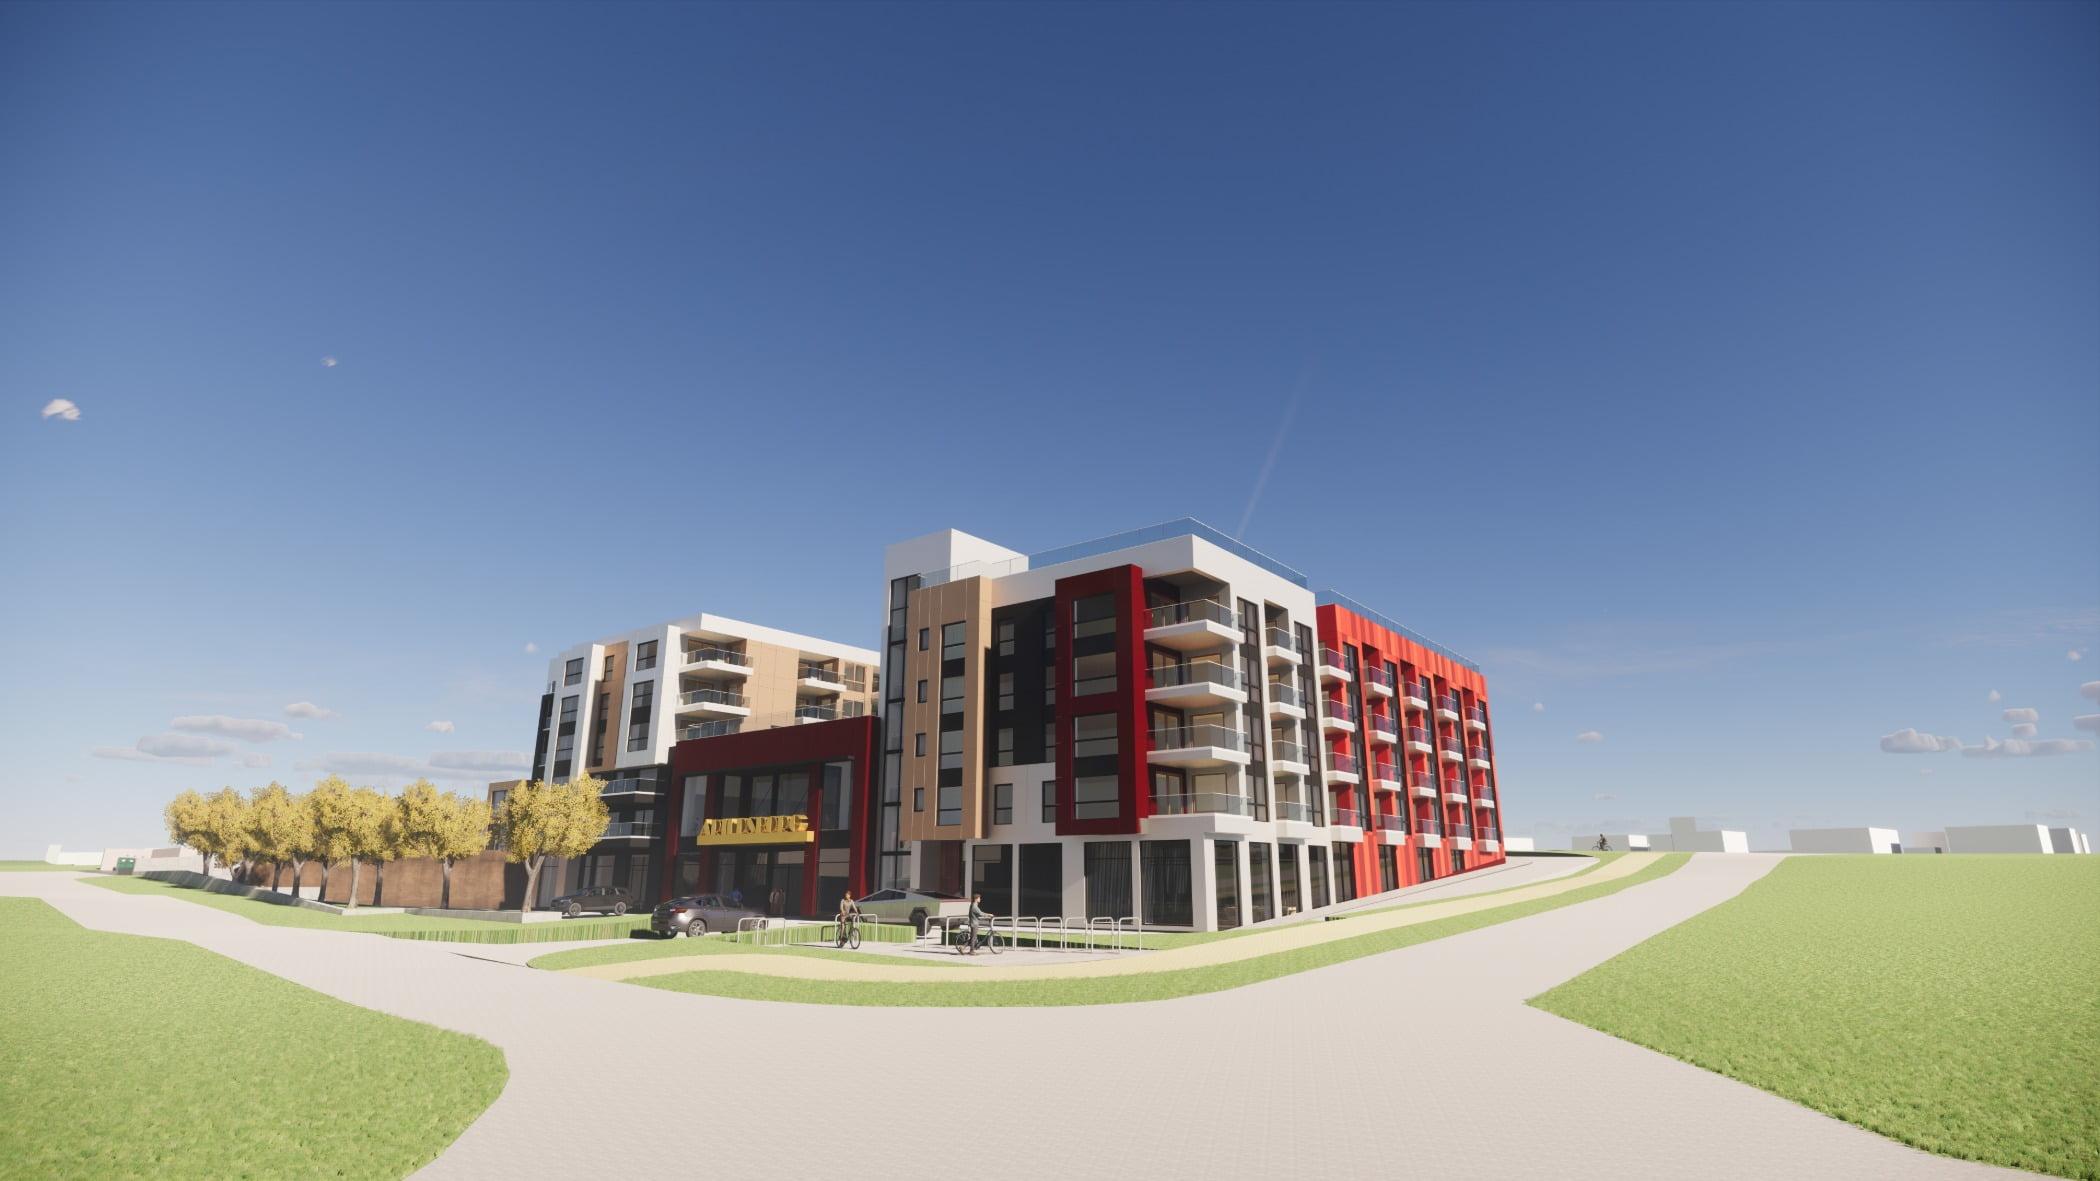 Land lot, Urban design, Sky, Daytime, Plant, Building, Tree